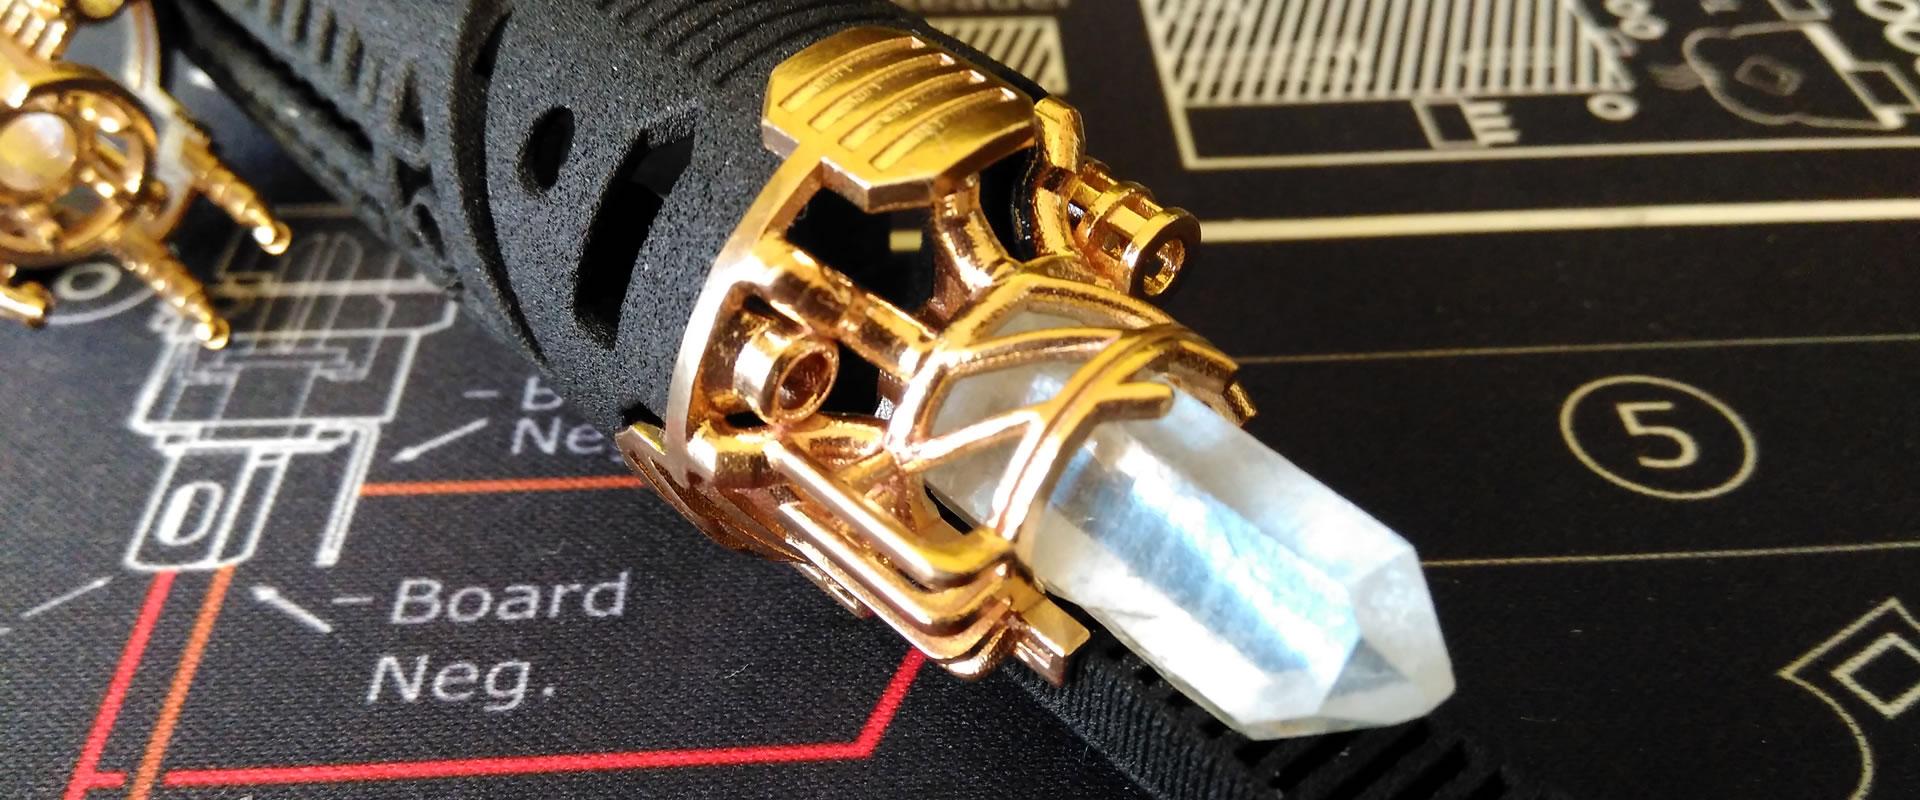 Lightsaber Installer   Custom Lightsaber Builder & Repairs